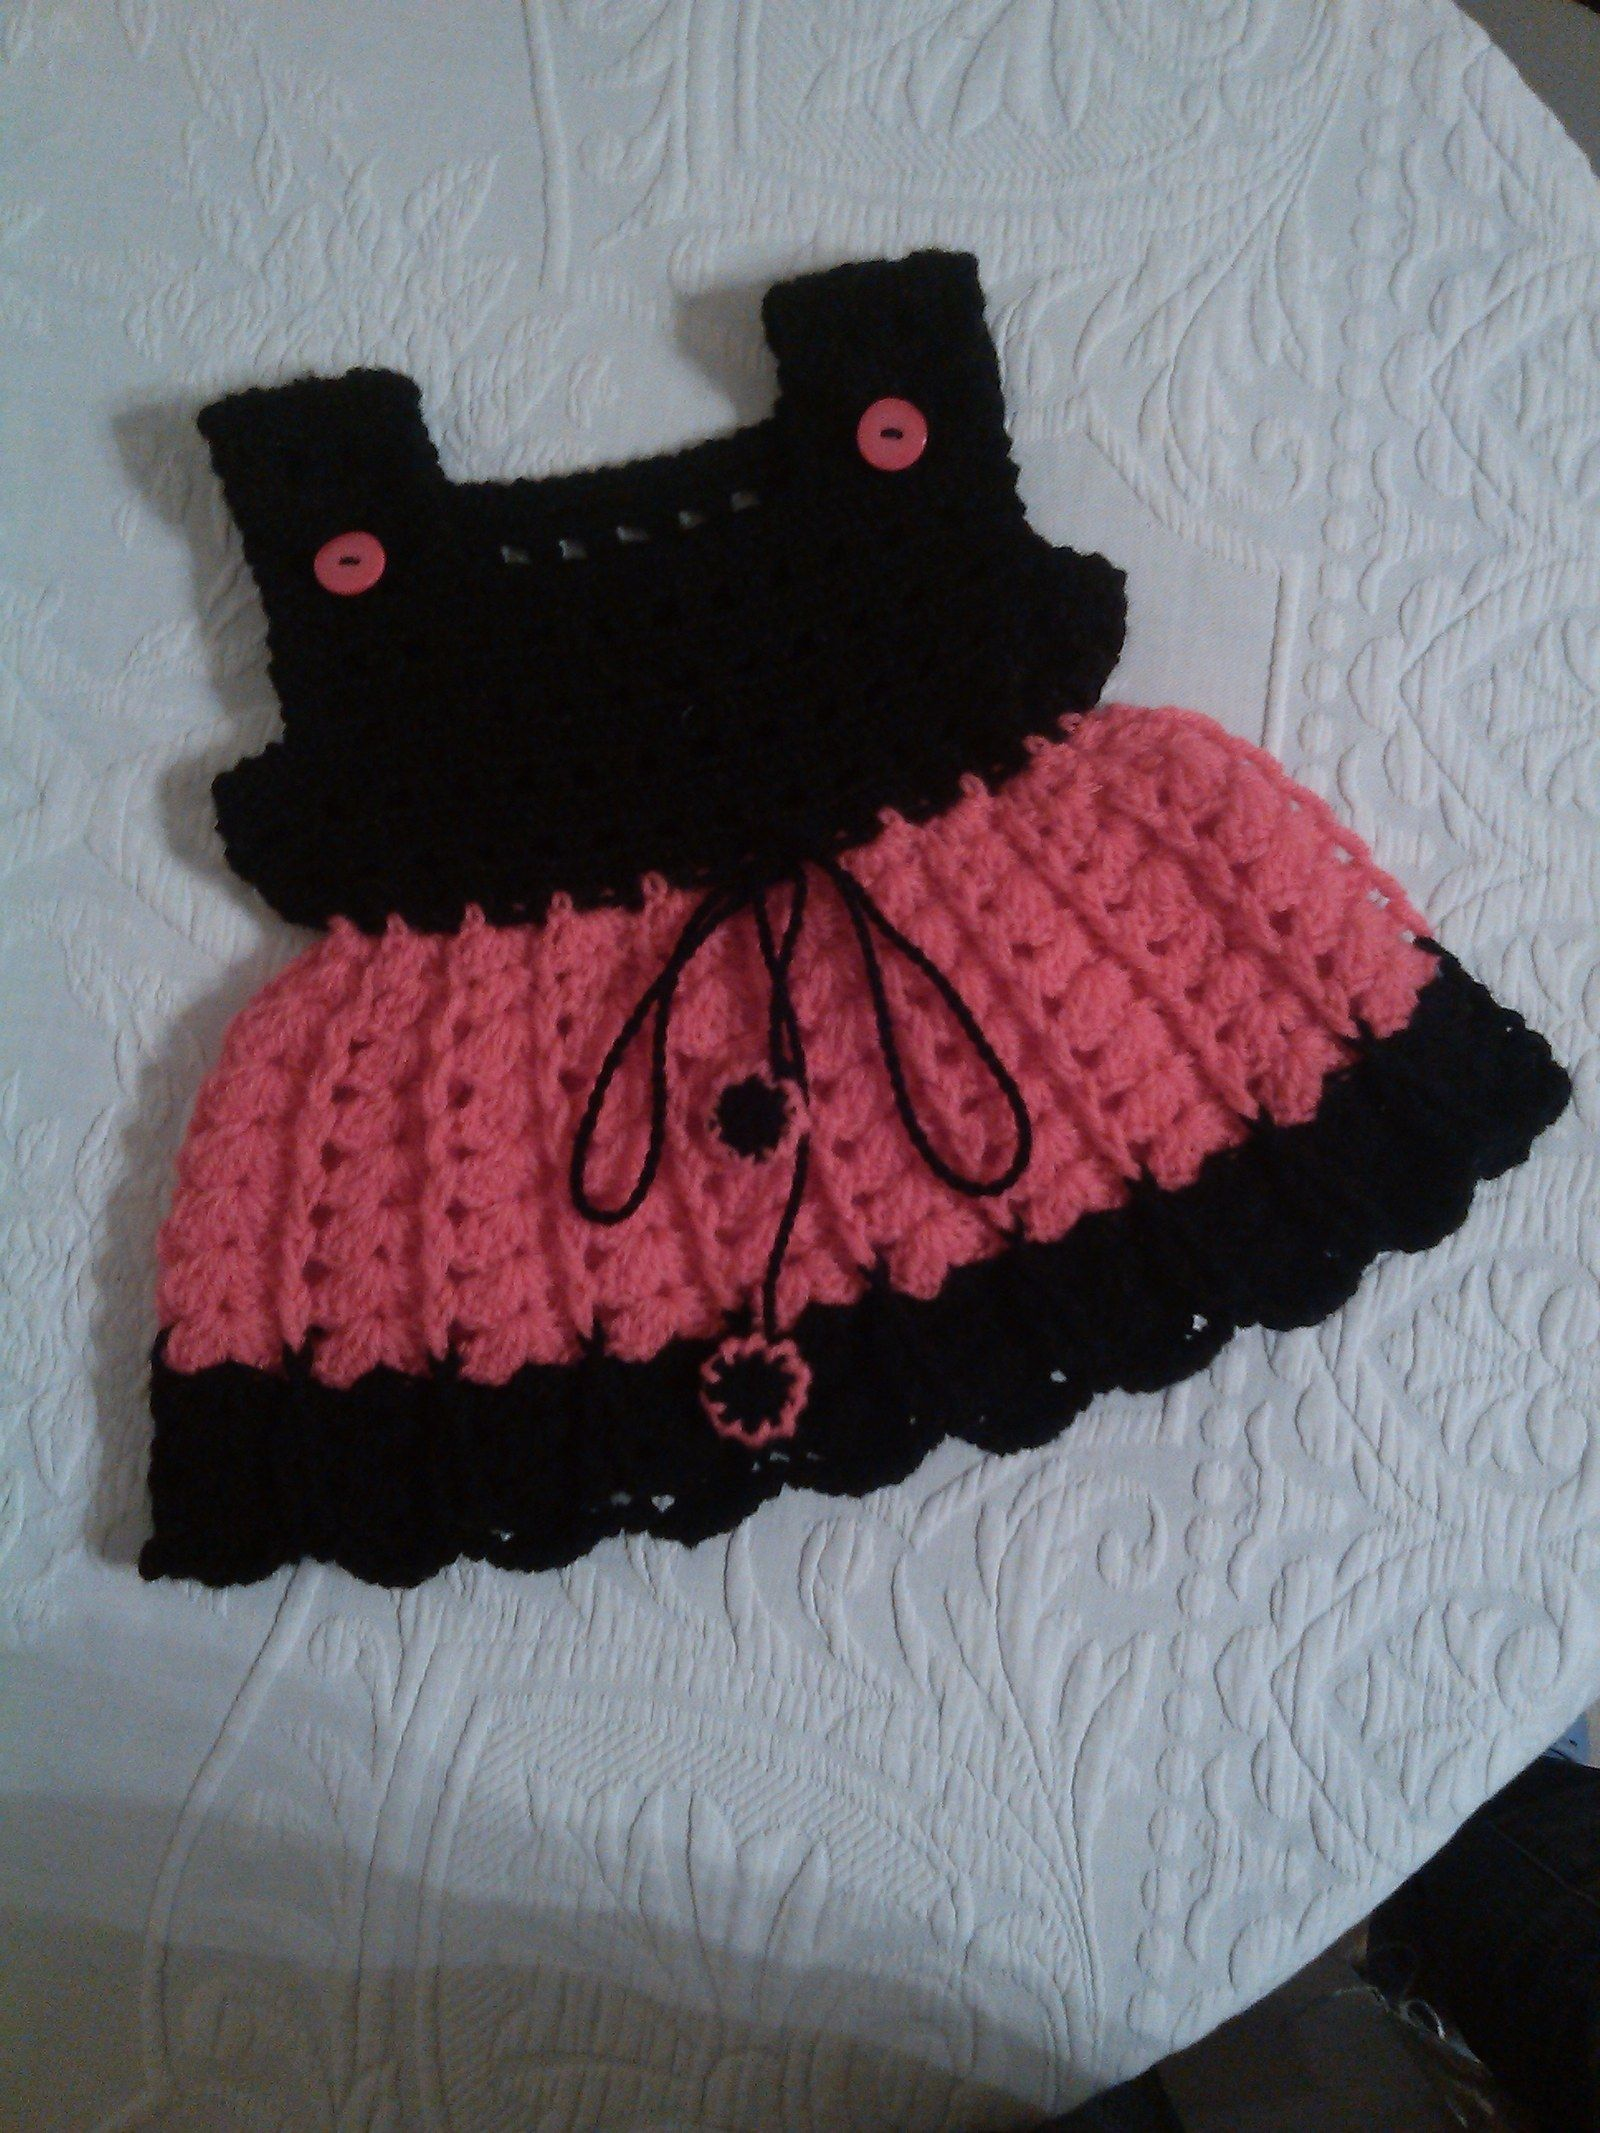 75070b44936c Šaty černo - růžové miki 50113 Dětské háčkované šatičky č 150113 Šíře zad -  pod průramky